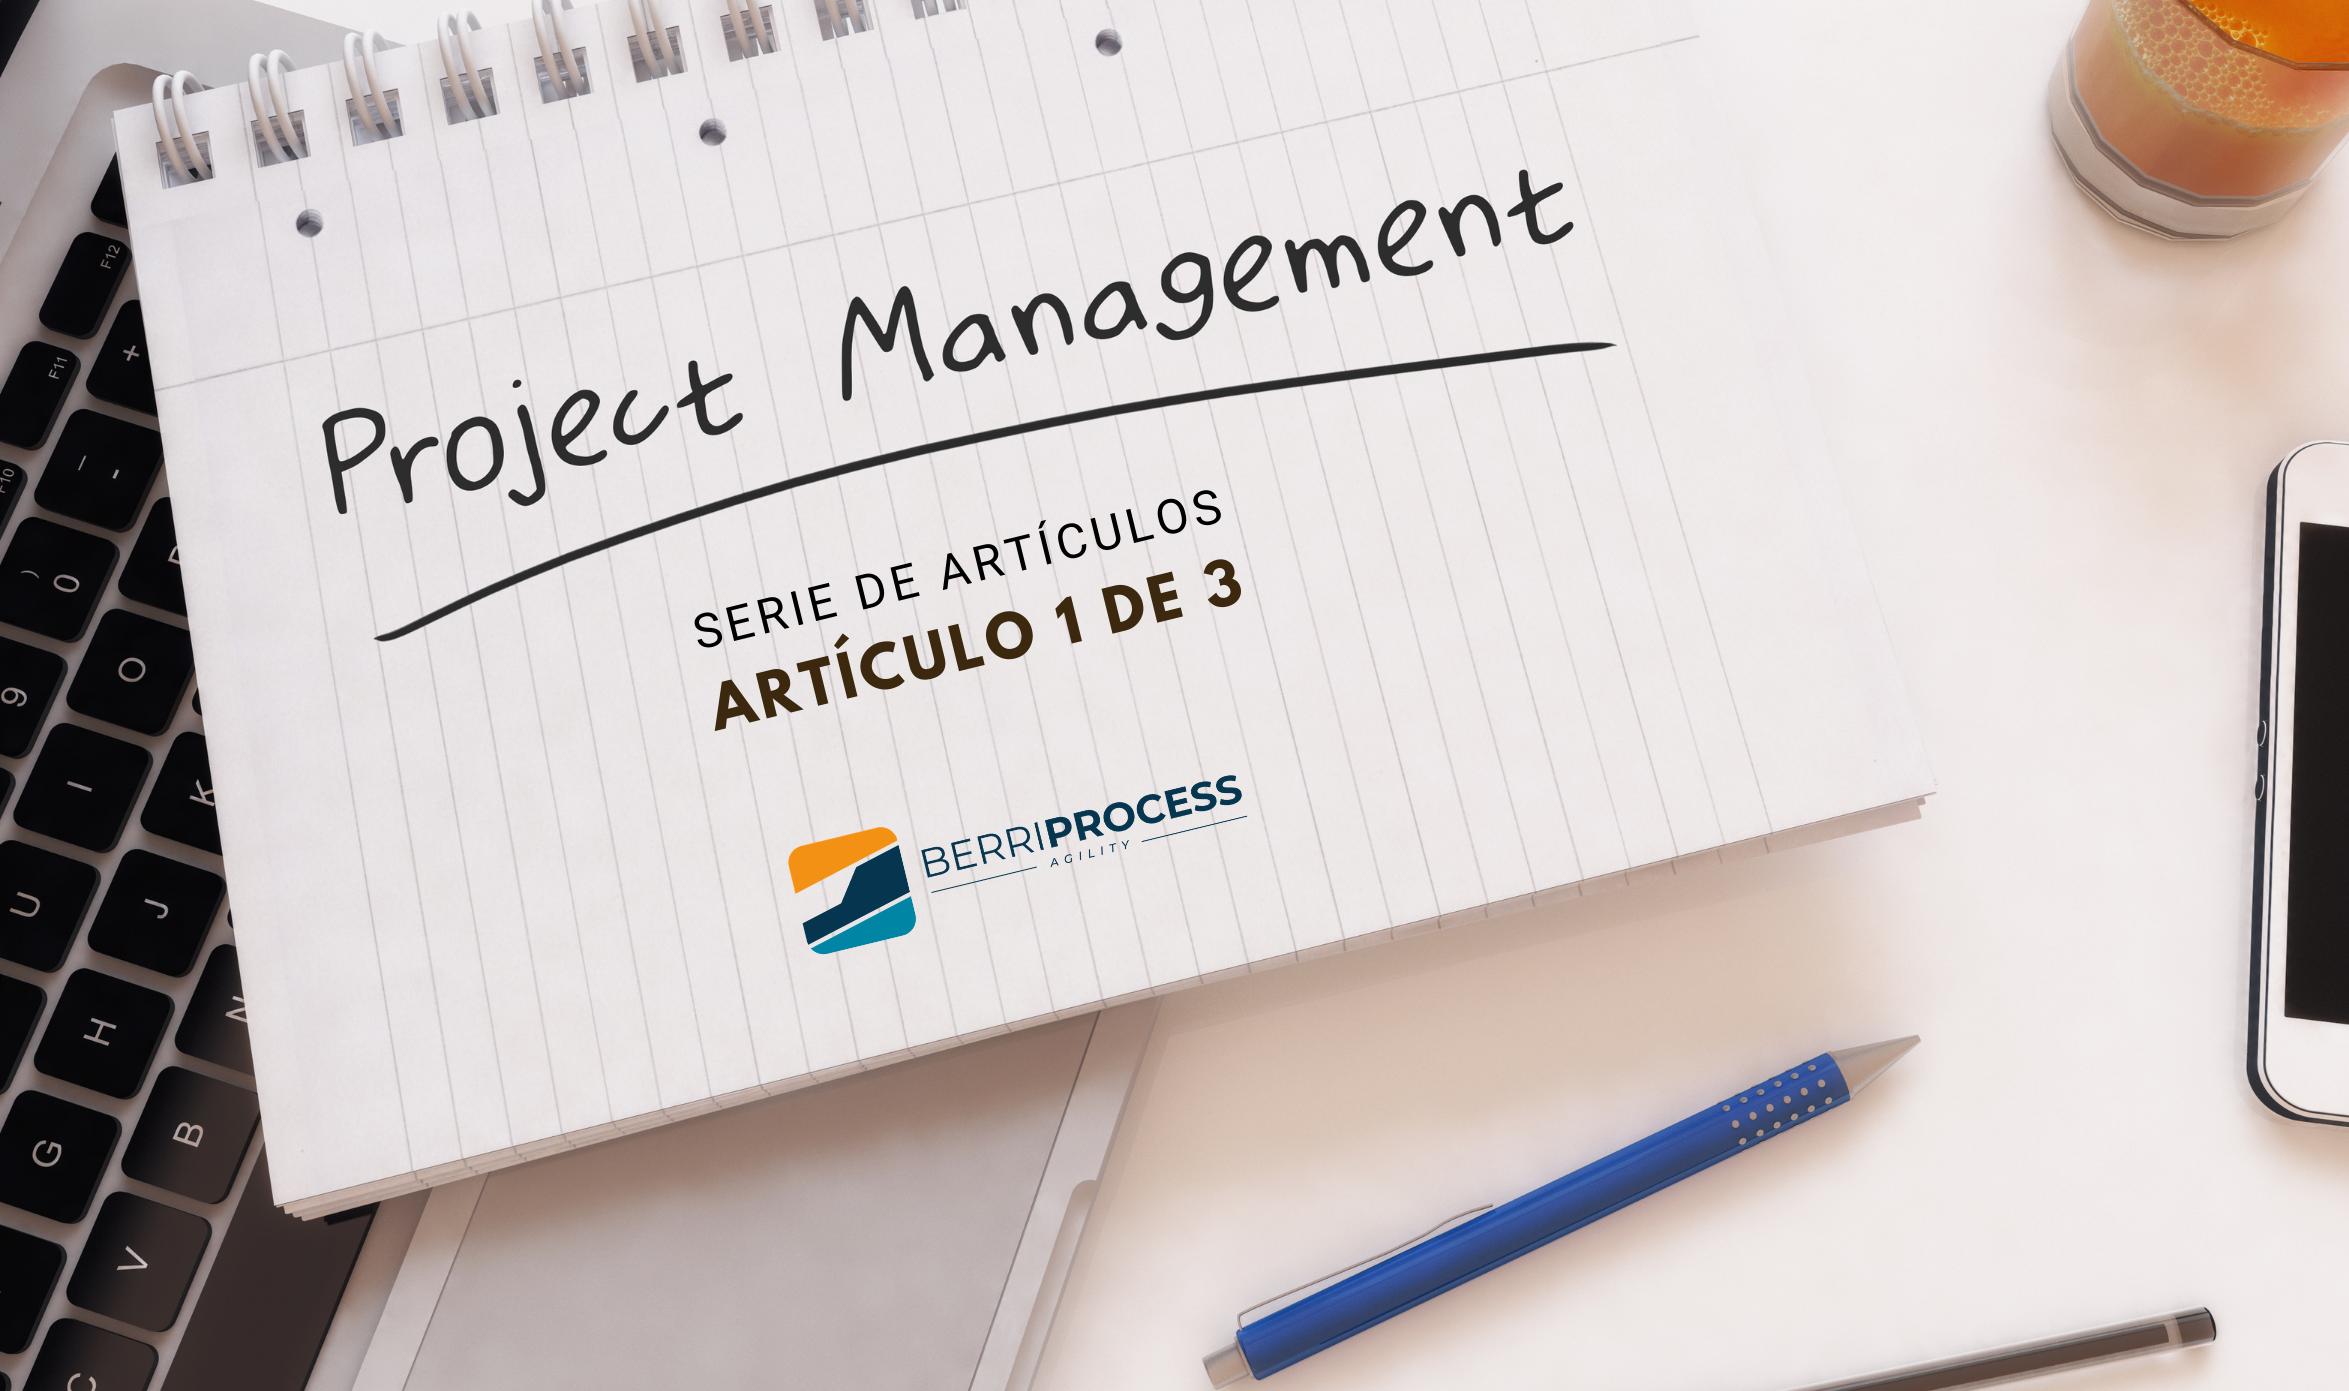 Imagen Post Project Management 1/3 serie de artículos